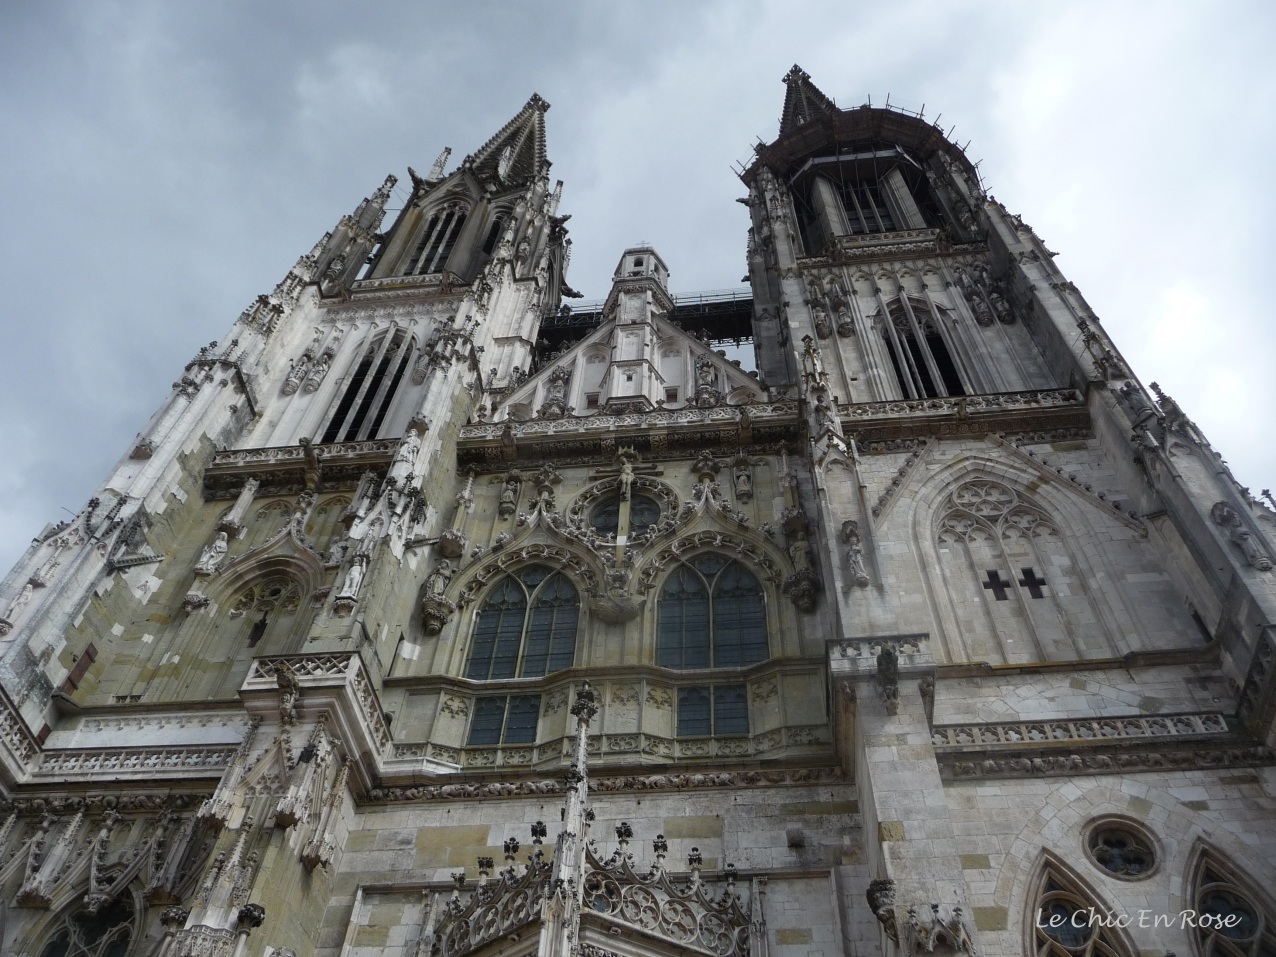 Front of St Peter's Dom Regensburg